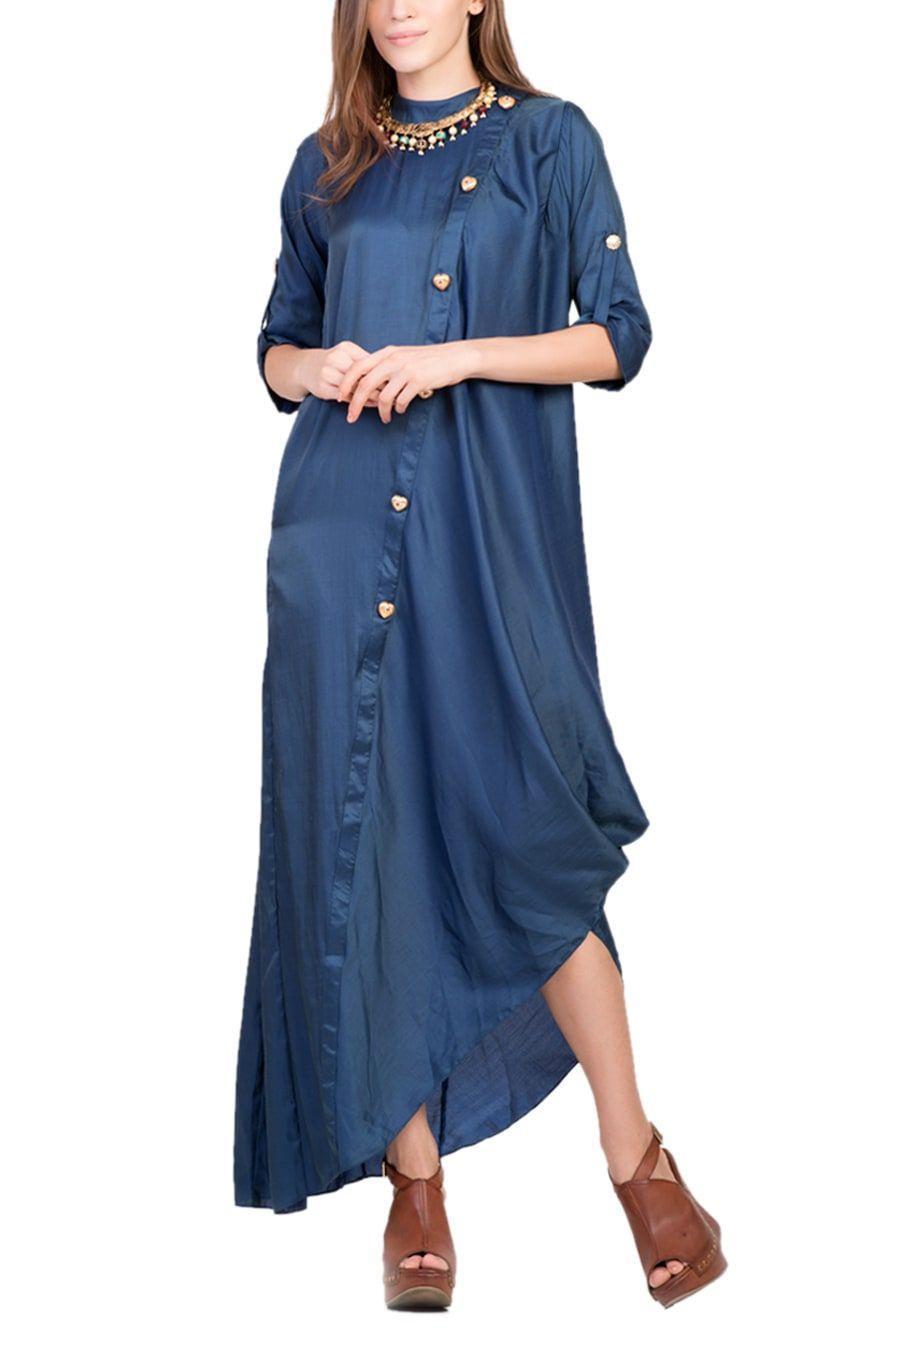 Fashion designer dresses dark royal blue cowl dress with heart